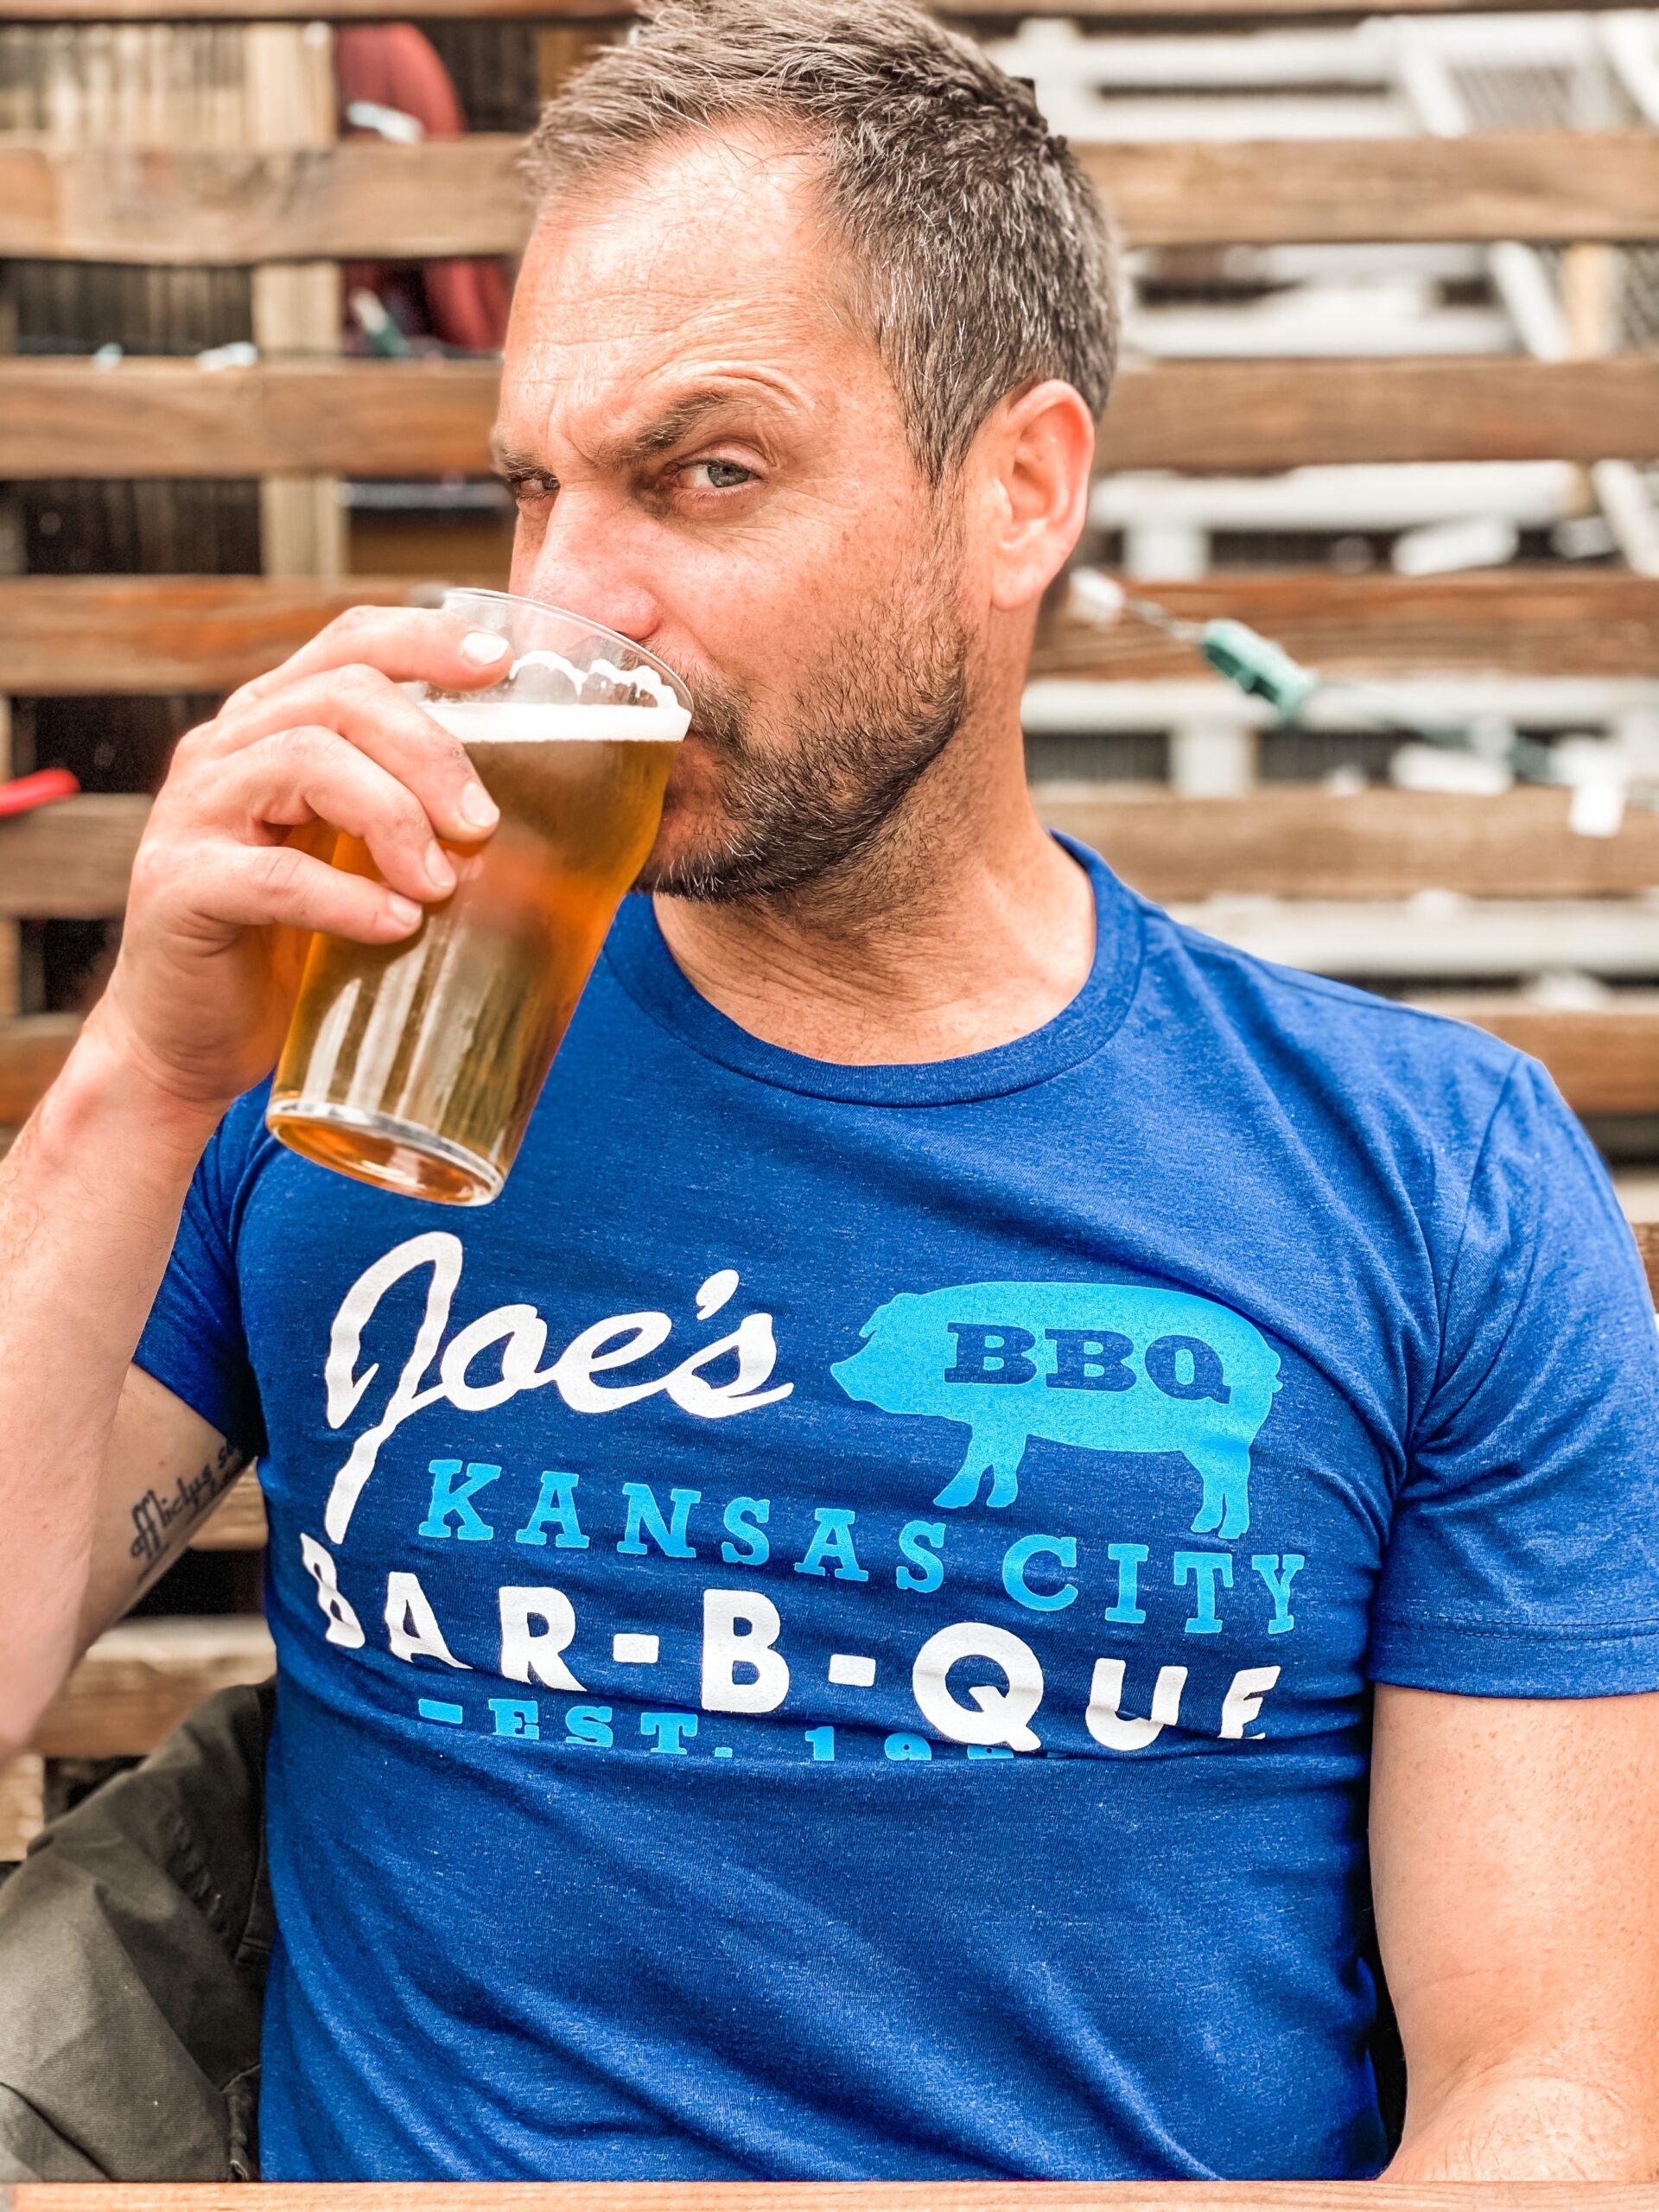 White man with beard drinking beer wearing blue t-shirt that reads Joe's bbq Kansas City Bar-B-Que